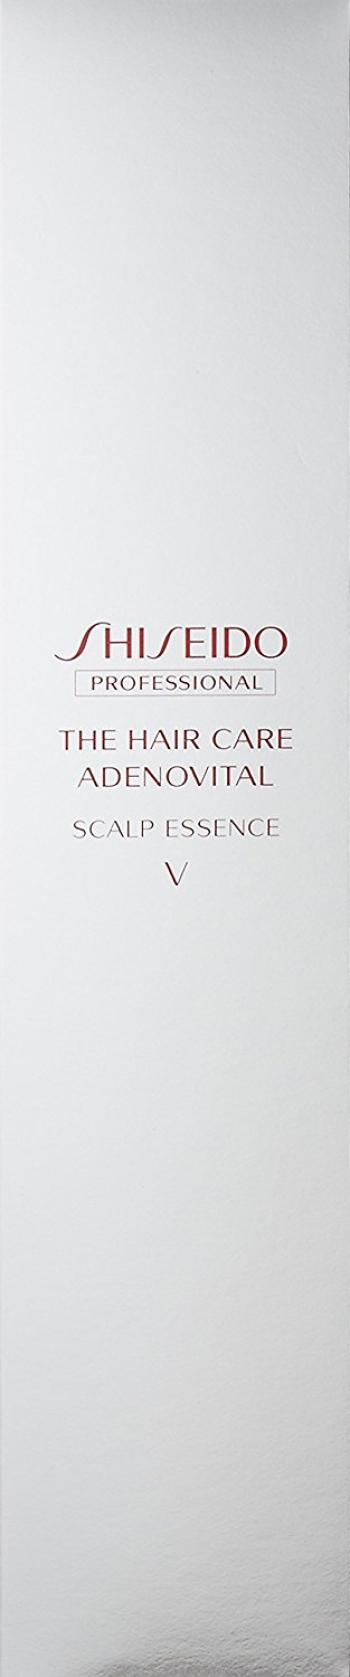 SHISEIDO Adenovital Scalp Essence, Эссенция для роста волос 180 мл